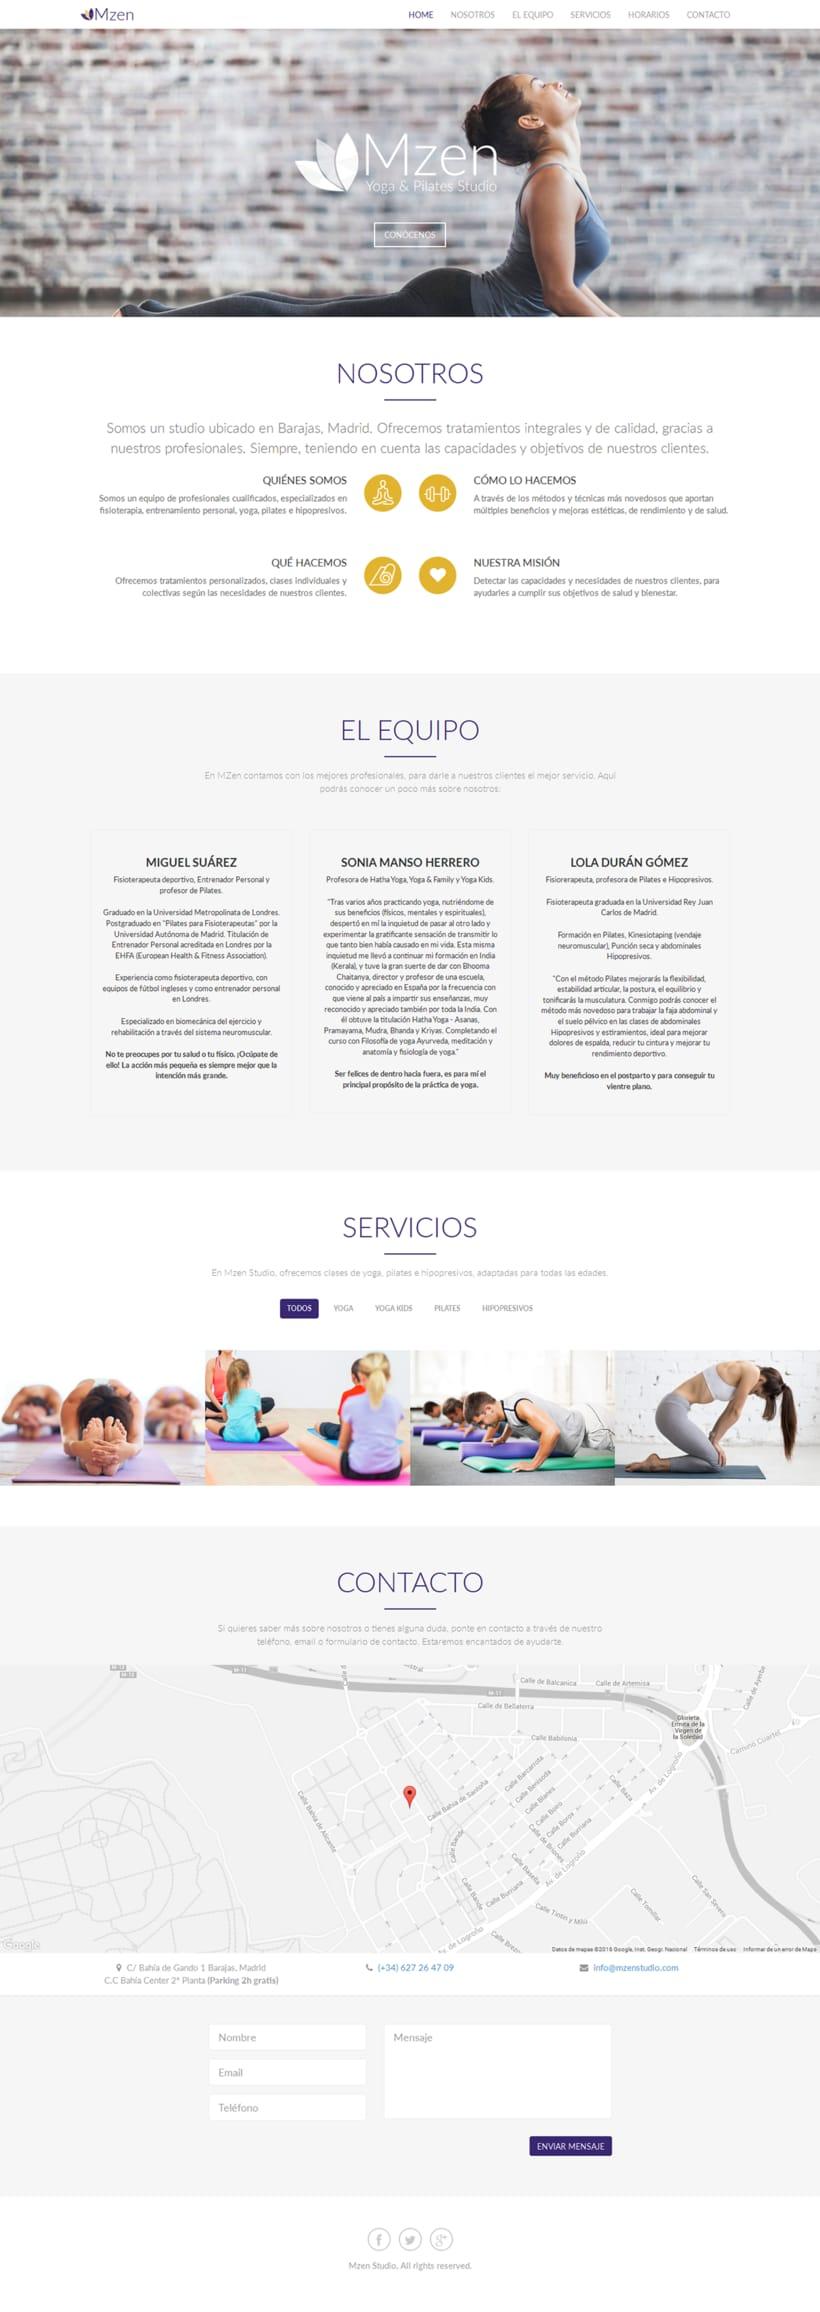 Imagen Corporativa Mzen Yoga & Pilates Studio 7